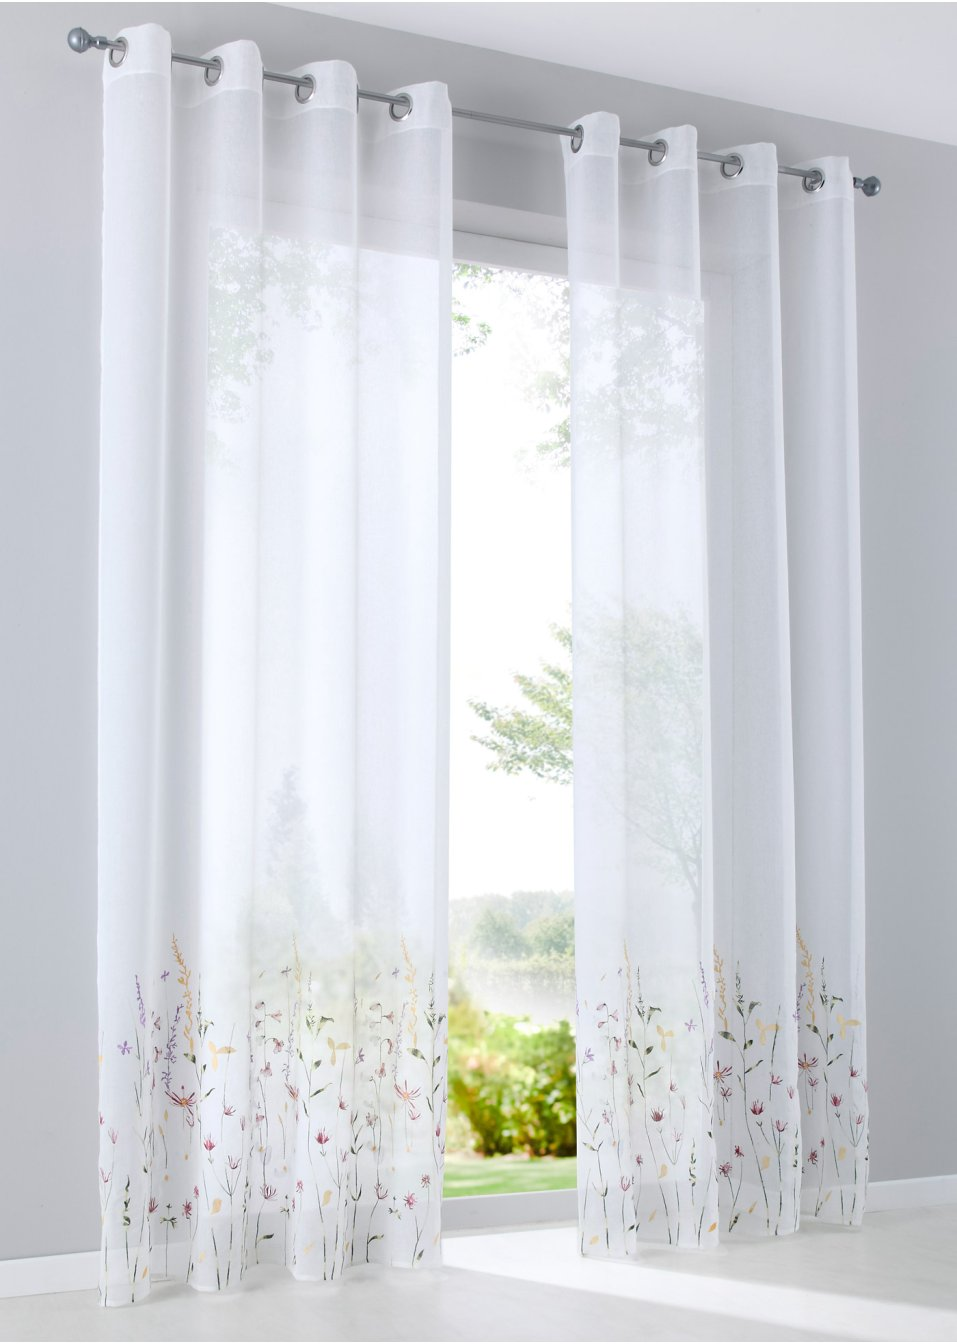 voilage alexa 1 pce blanc multicolore bpc living commande online. Black Bedroom Furniture Sets. Home Design Ideas